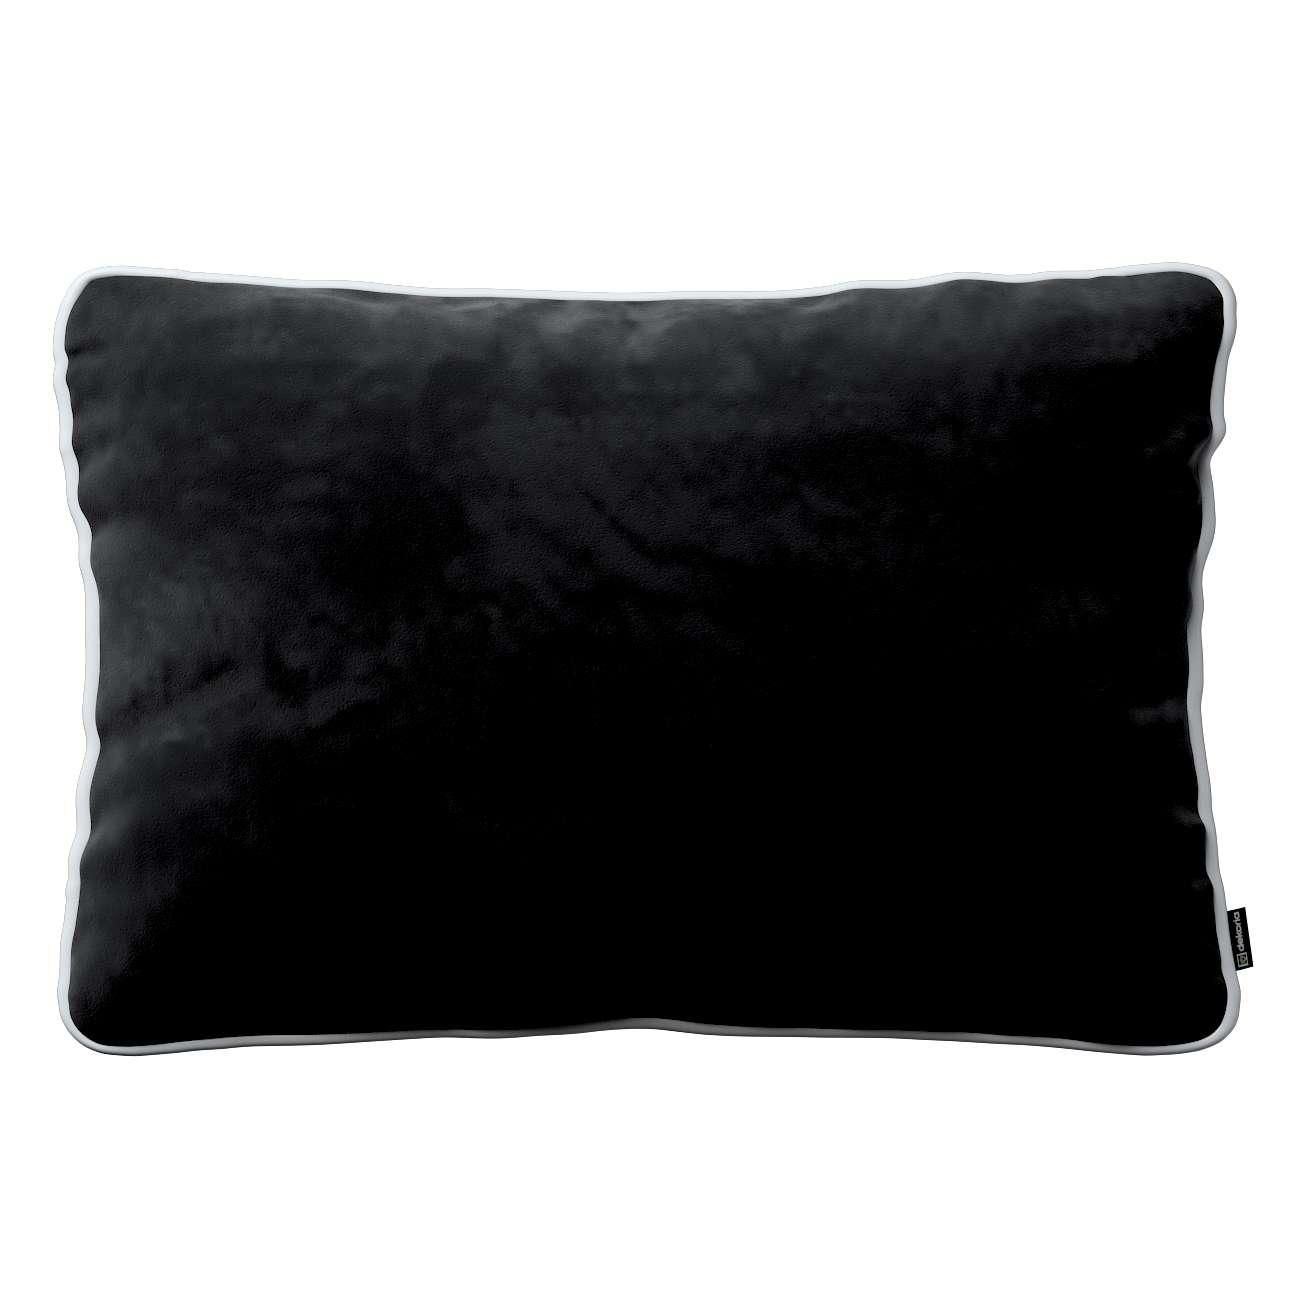 Poszewka Laura na poduszkę prostokątna 60 × 40 cm w kolekcji Velvet, tkanina: 704-17